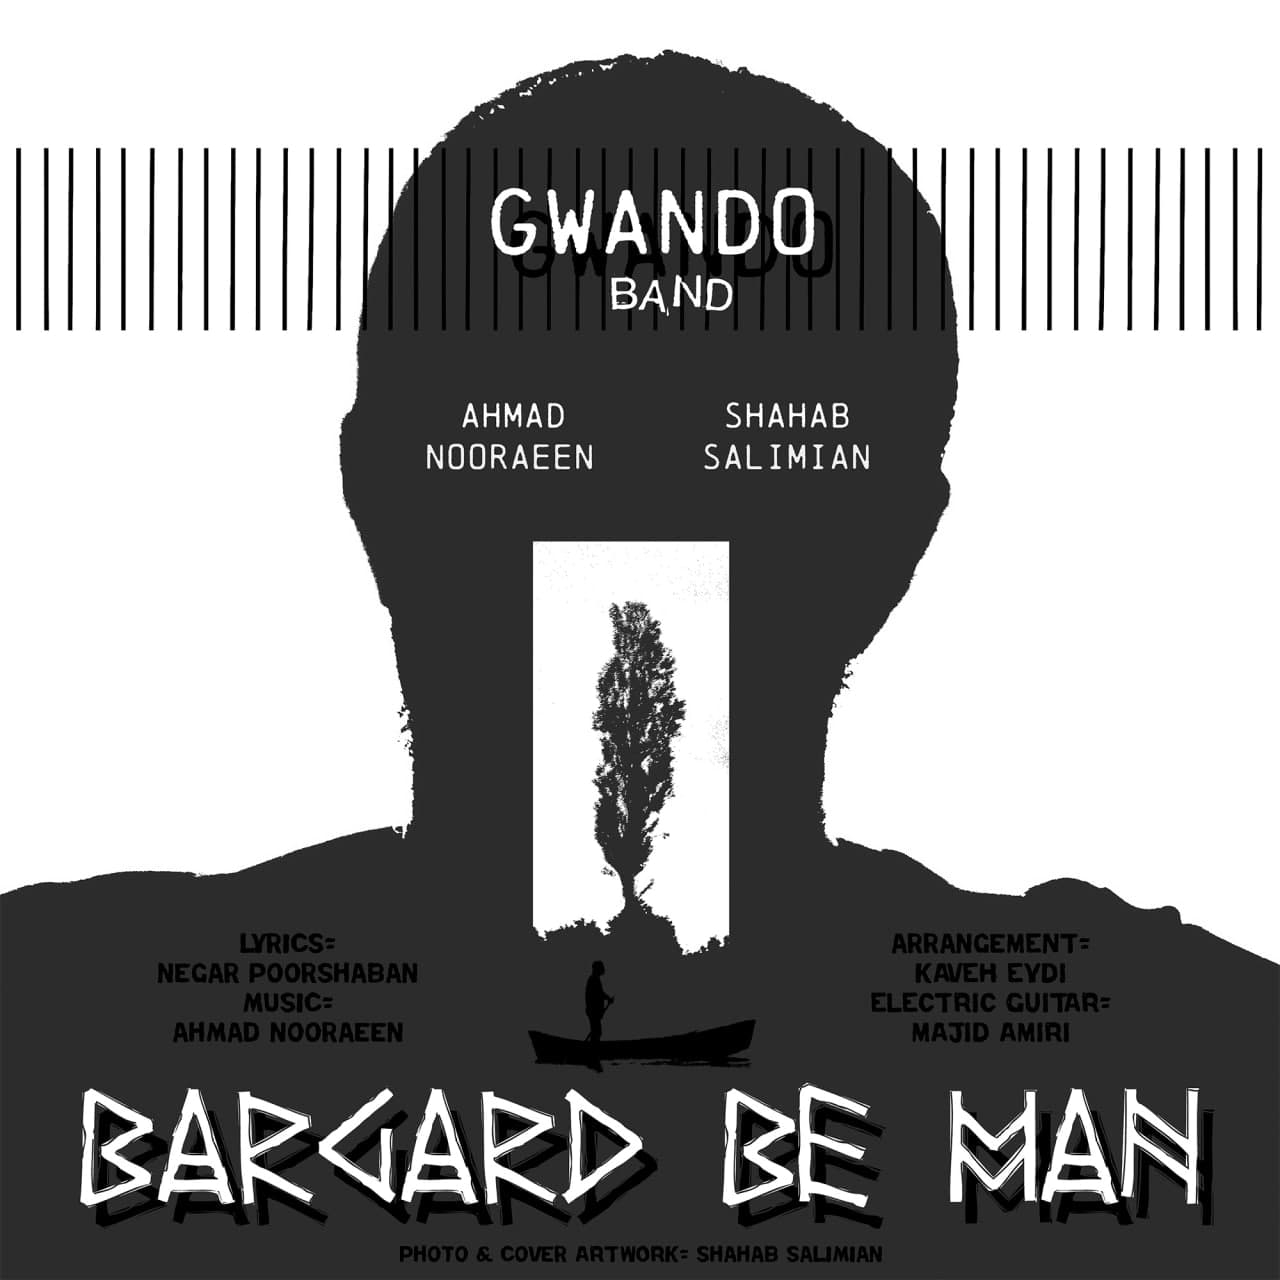 Gwando Band – Bargard Be Man